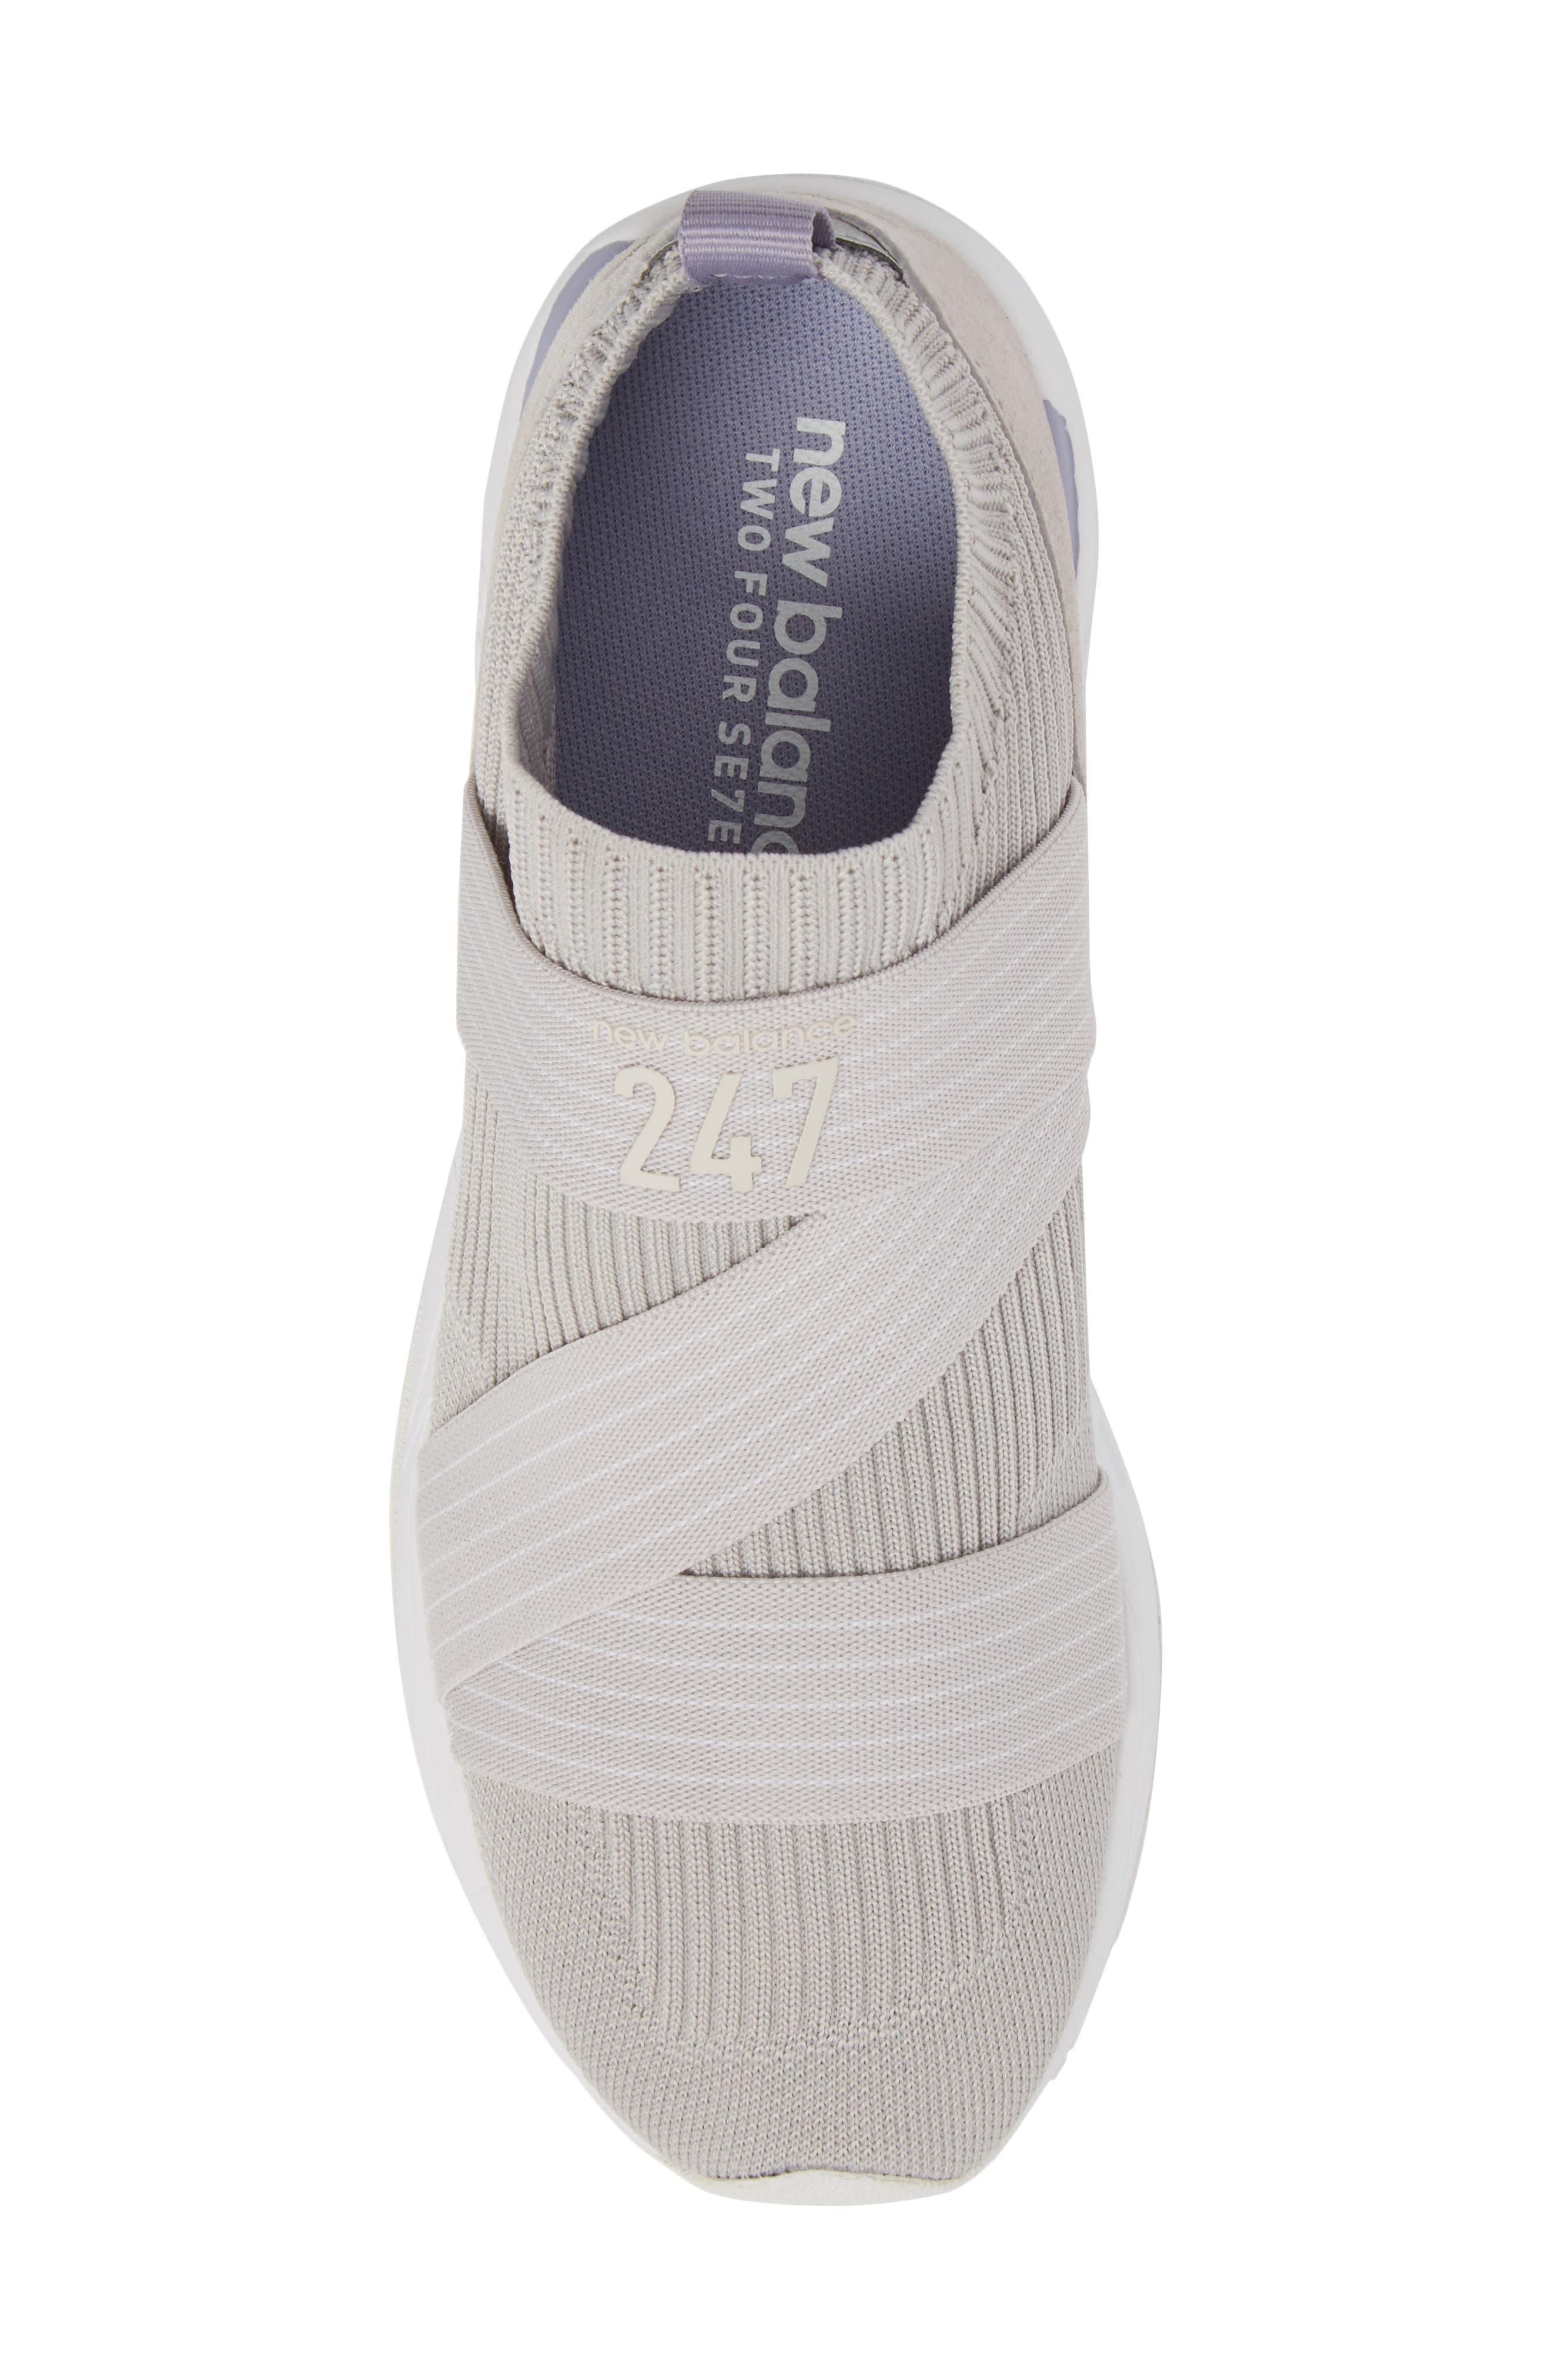 247 Knit Sneaker,                             Alternate thumbnail 9, color,